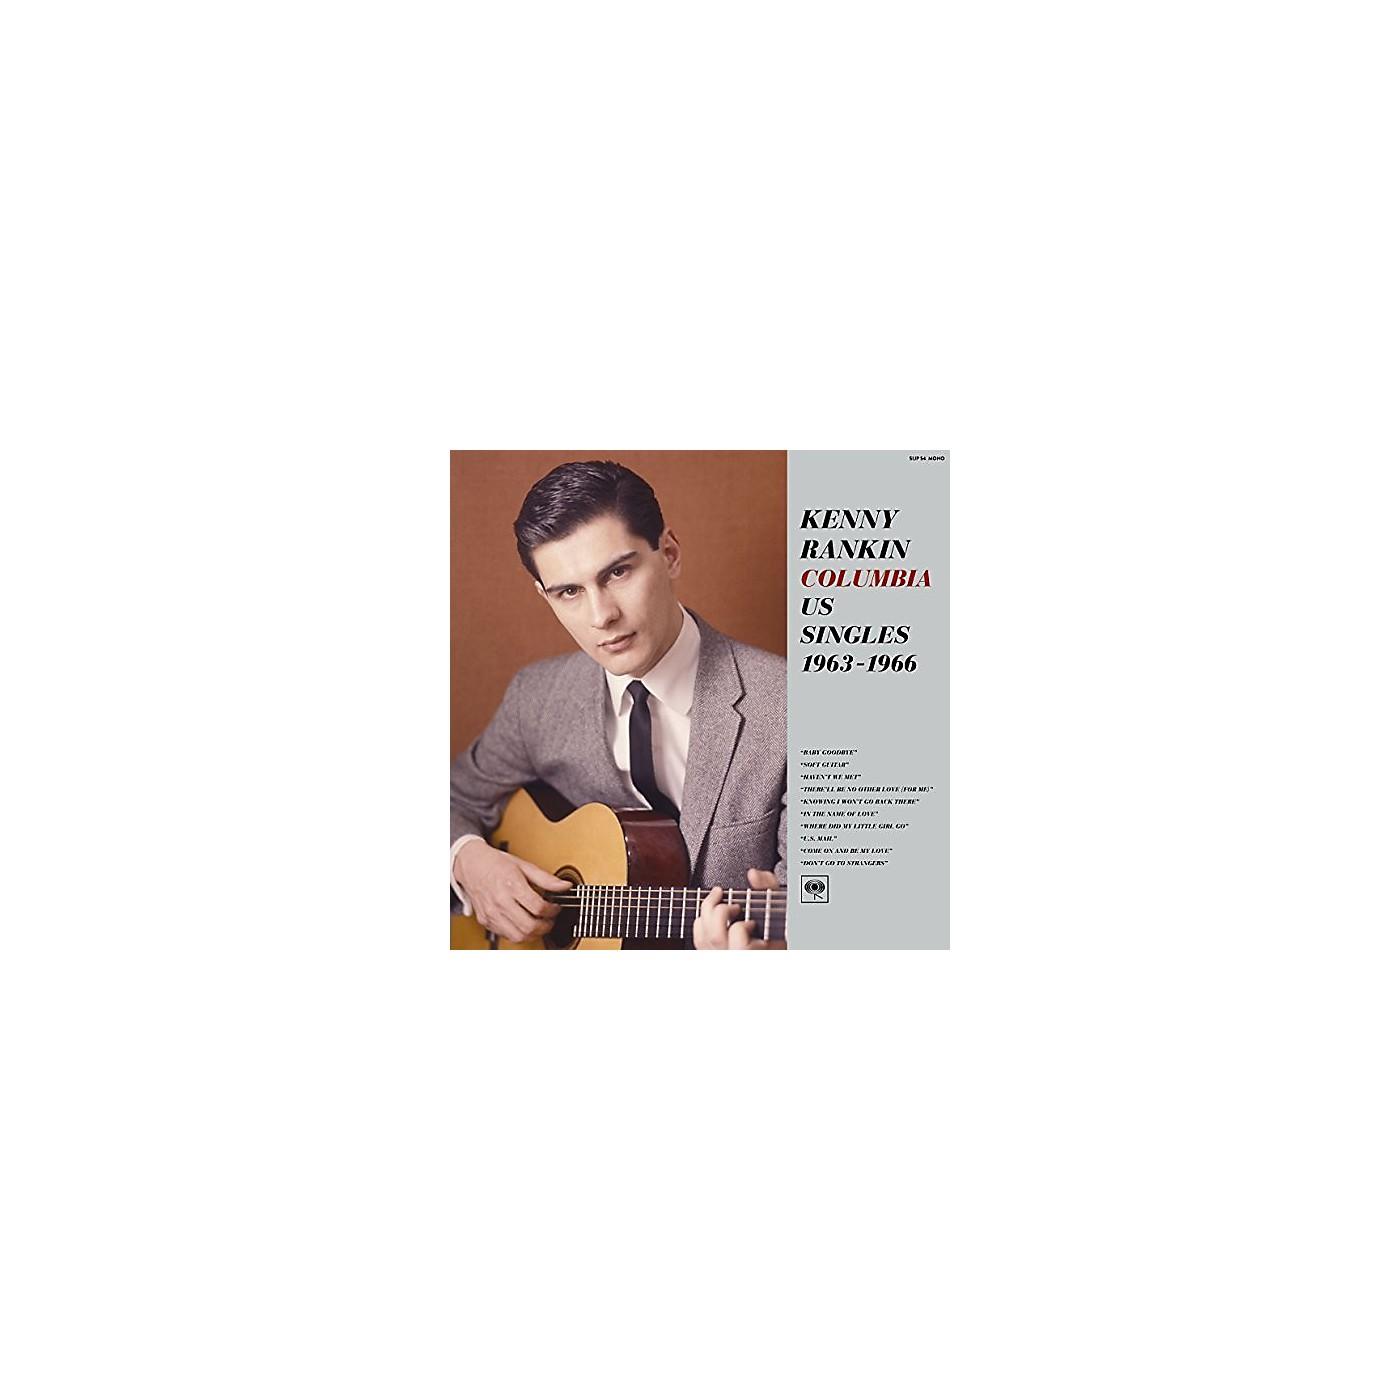 Alliance Kenny Rankin - Complete Columbia Singles 1963-1967 thumbnail